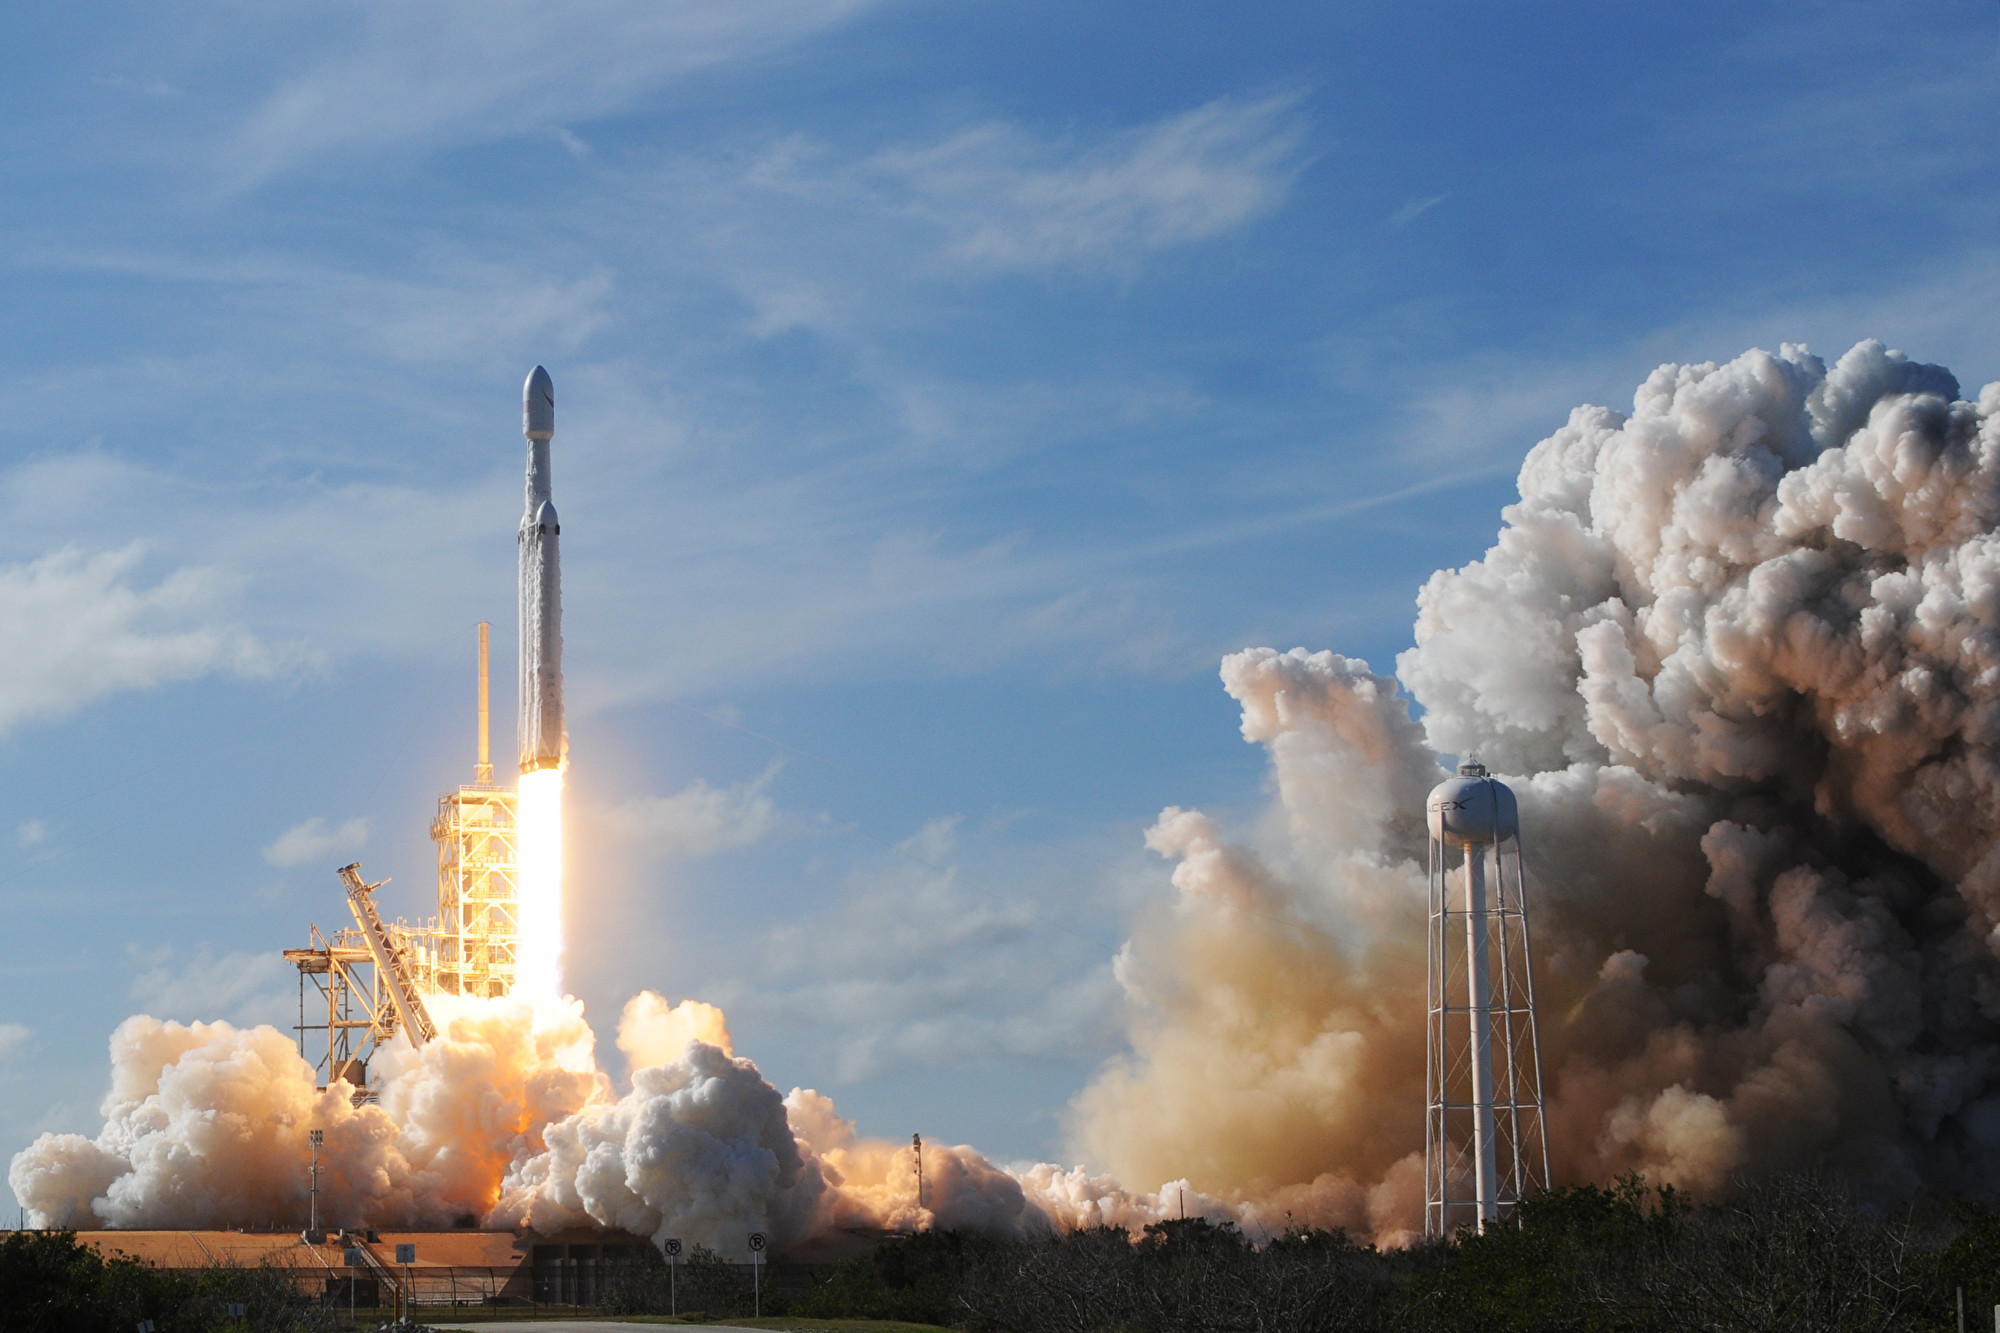 NASA宣佈,兩名太空人將於5月搭乘SpaceX製造的火箭到國際太空站。圖為SpaceX火箭2018年2月6日在佛州甘迺迪航天中心的39A發射台升空。(JIM WATSON/AFP)